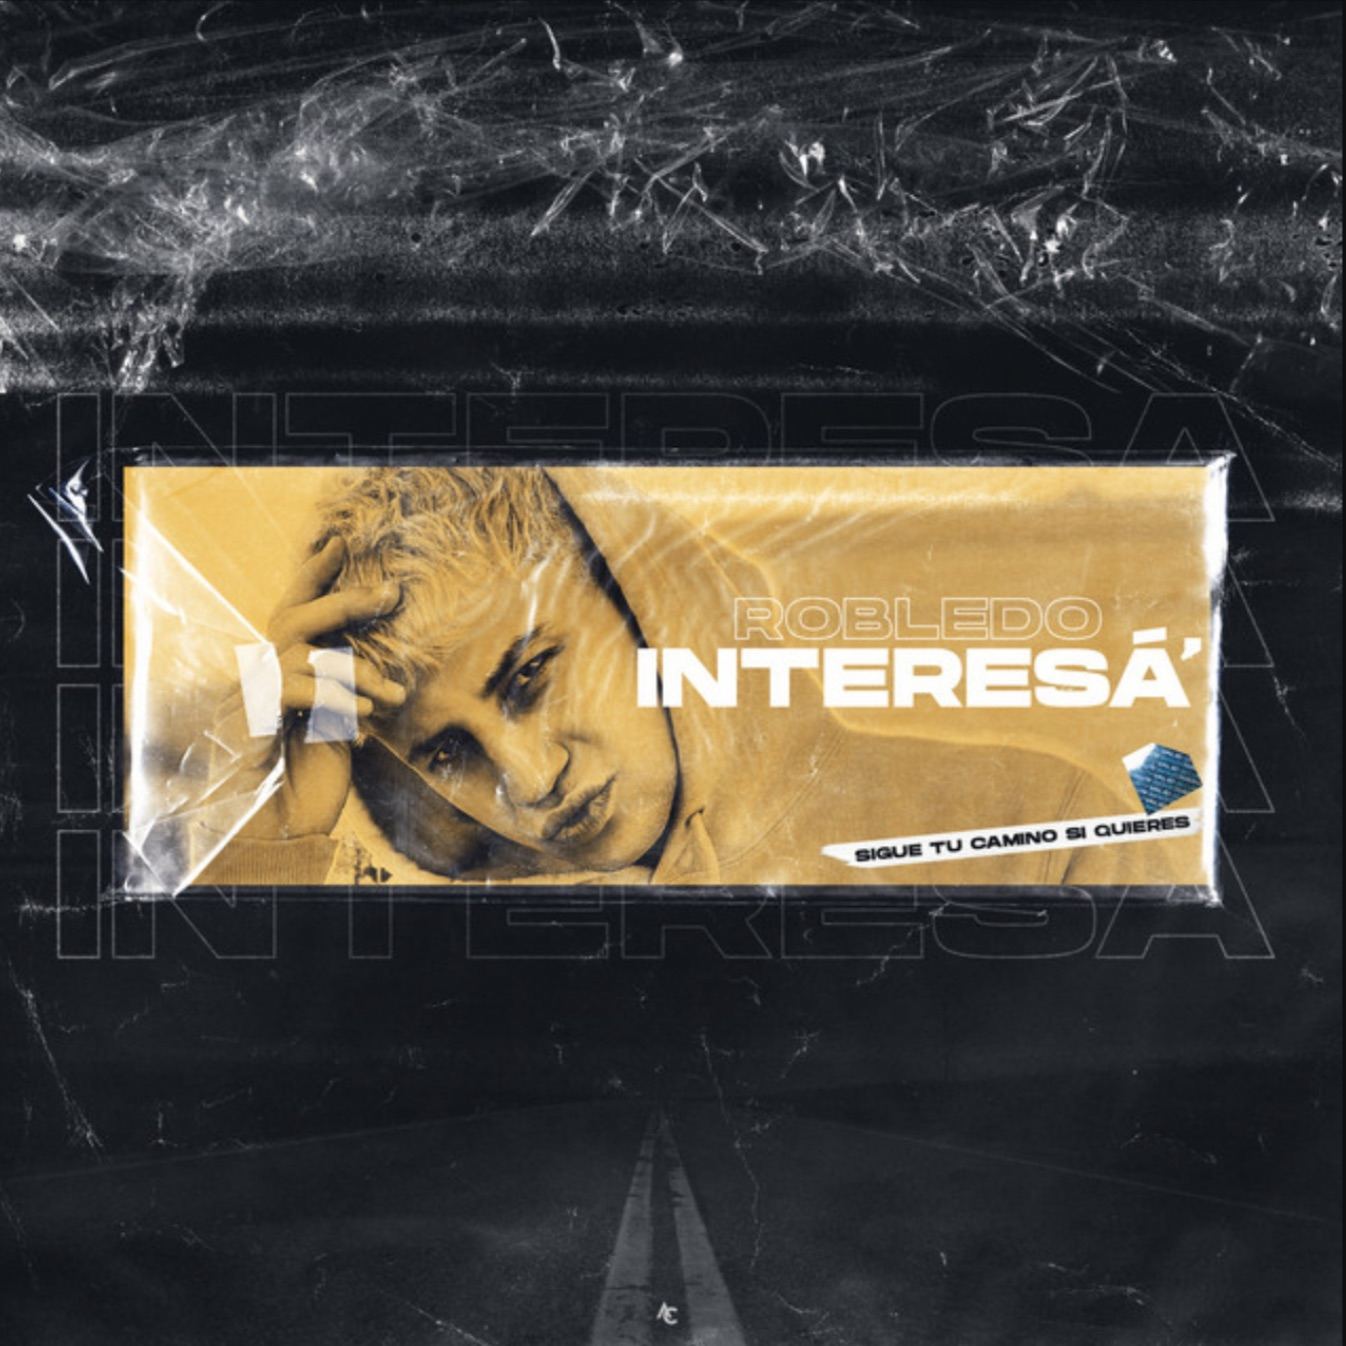 robledo interesa cover artwork